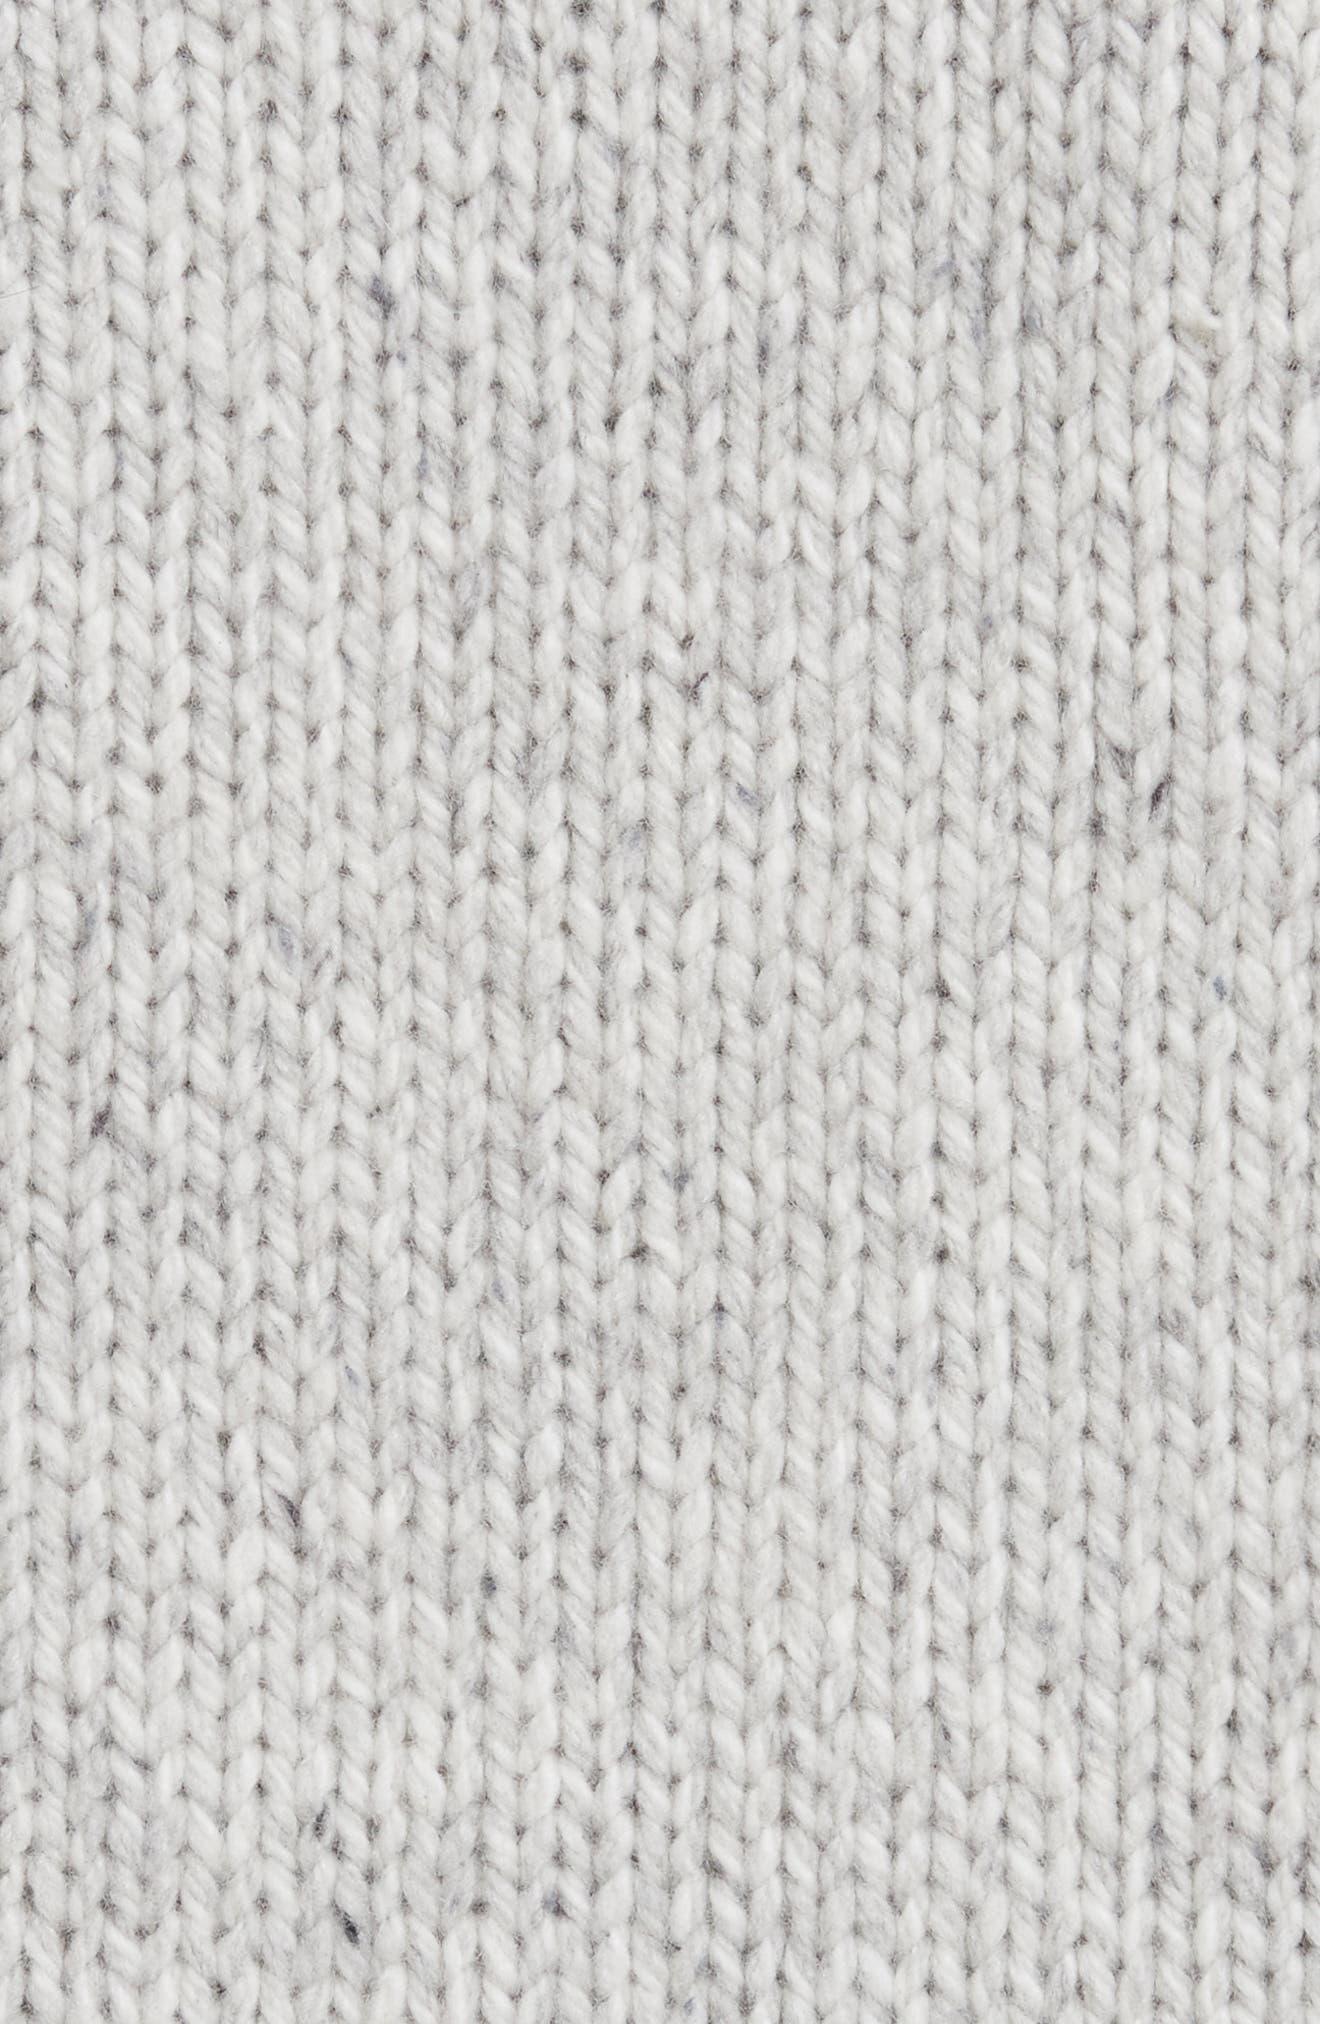 Marled Wool Blend Cardigan,                             Alternate thumbnail 5, color,                             026